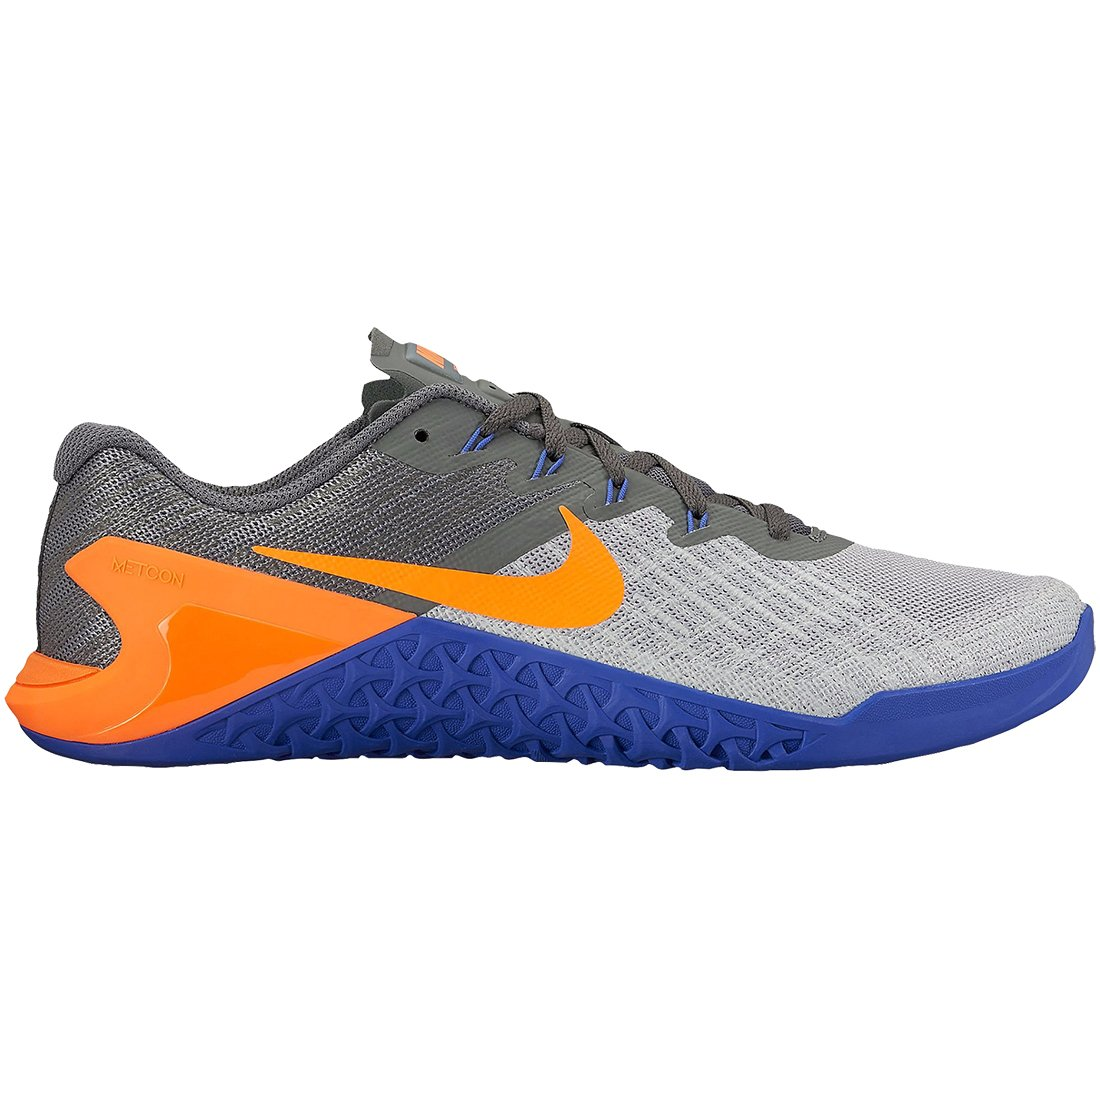 competitive price f0ef4 9c0e8 Amazon.com   Mens Nike Metcon 3 Training Shoe WOLF GREY TART-DARK GREY-PARAMOUNT  BLUE 15.0   Fitness   Cross-Training